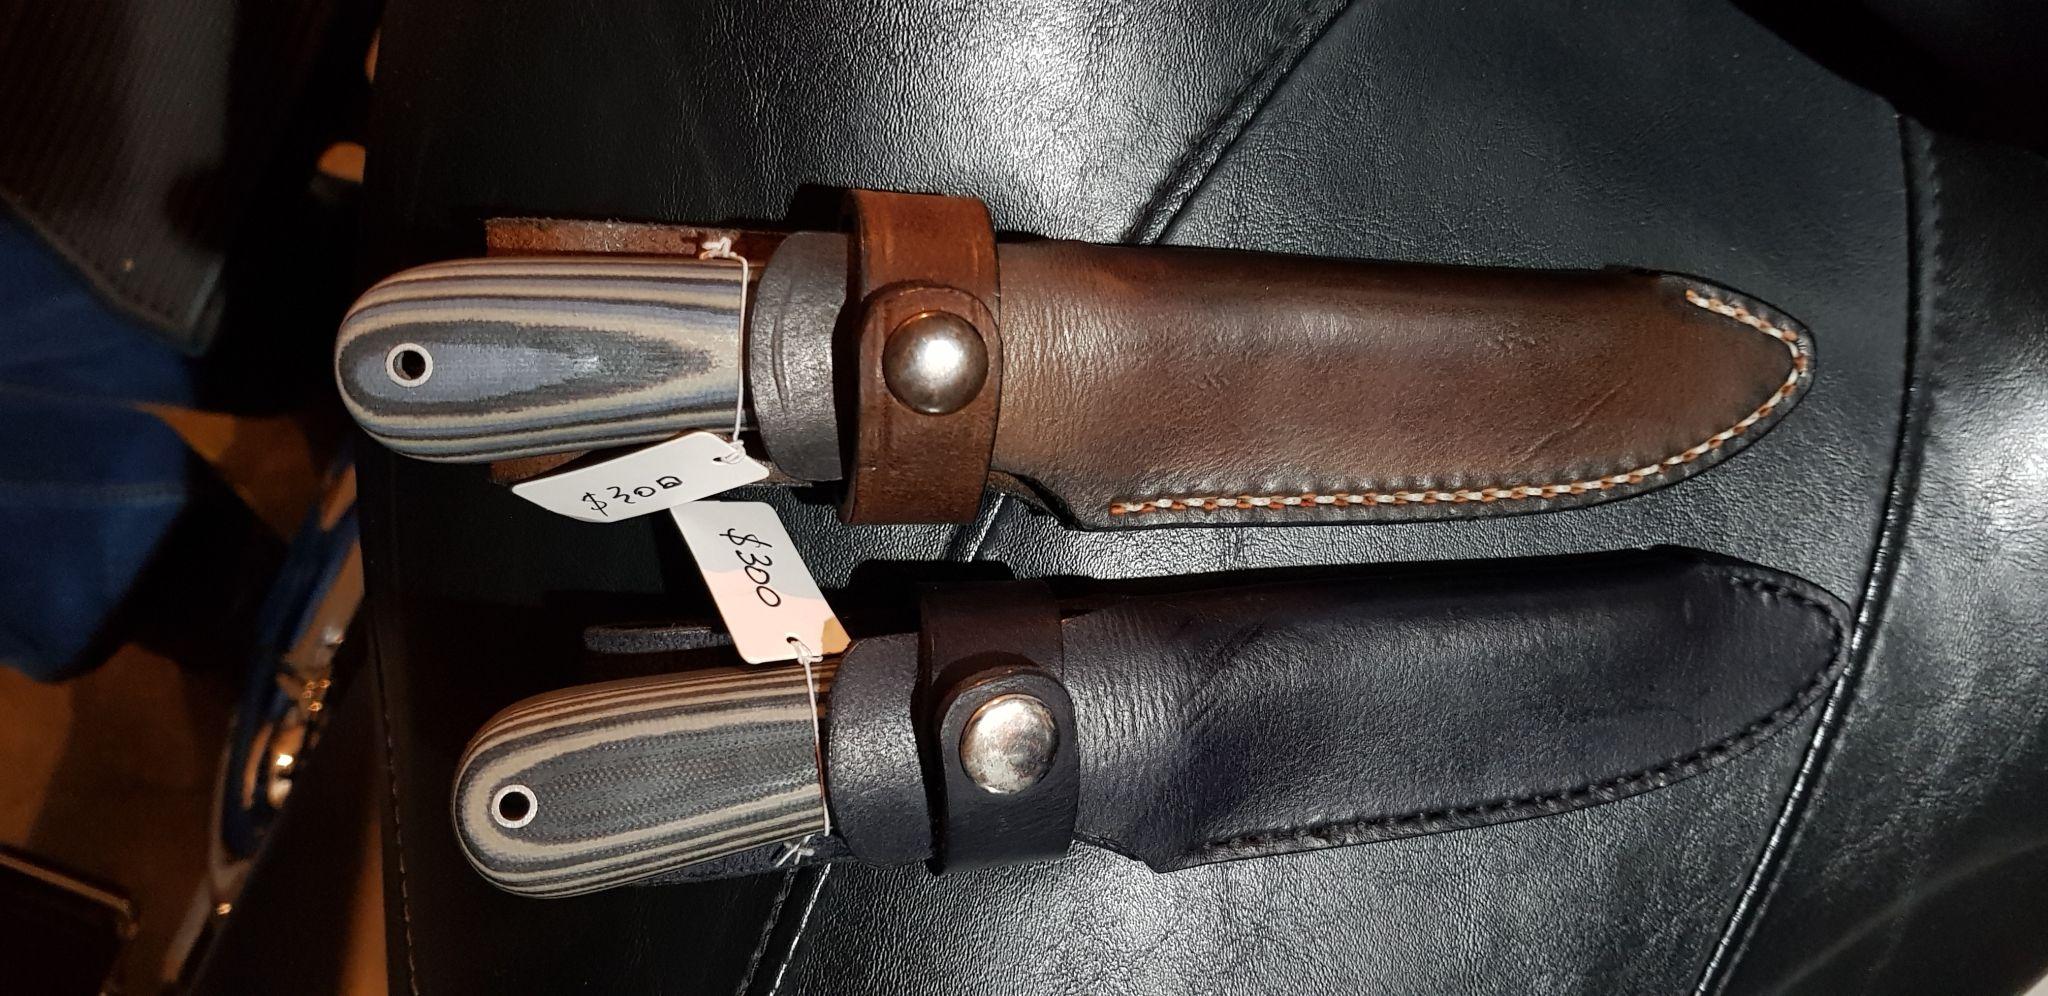 Name:  sandt G10 blade in sheath.jpg Views: 110 Size:  380.4 KB